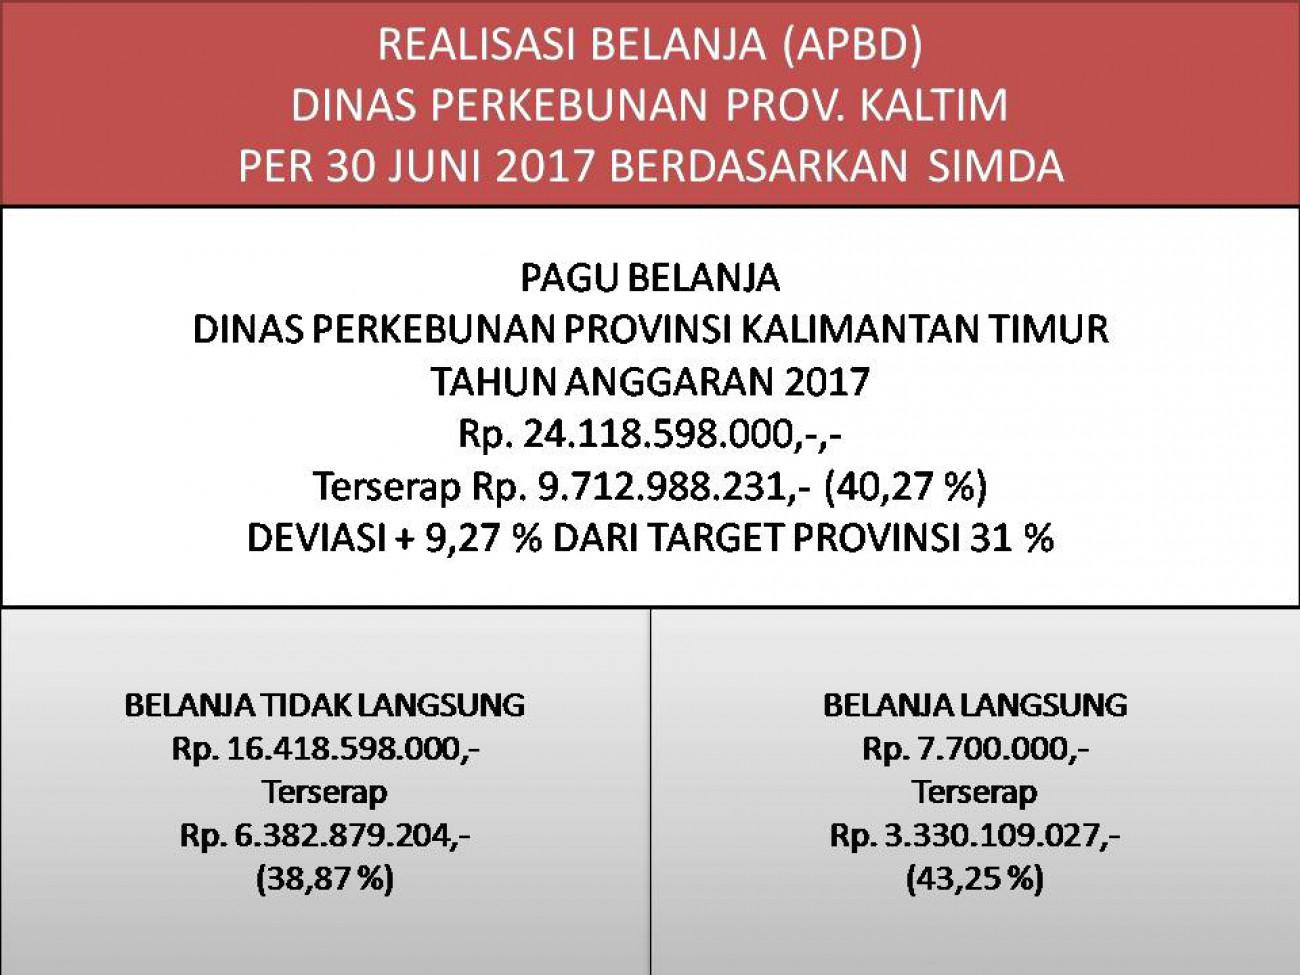 Laporan Realisasi APBD Dinas Perkebunan Prov. Kaltim Bulan Juni 2017